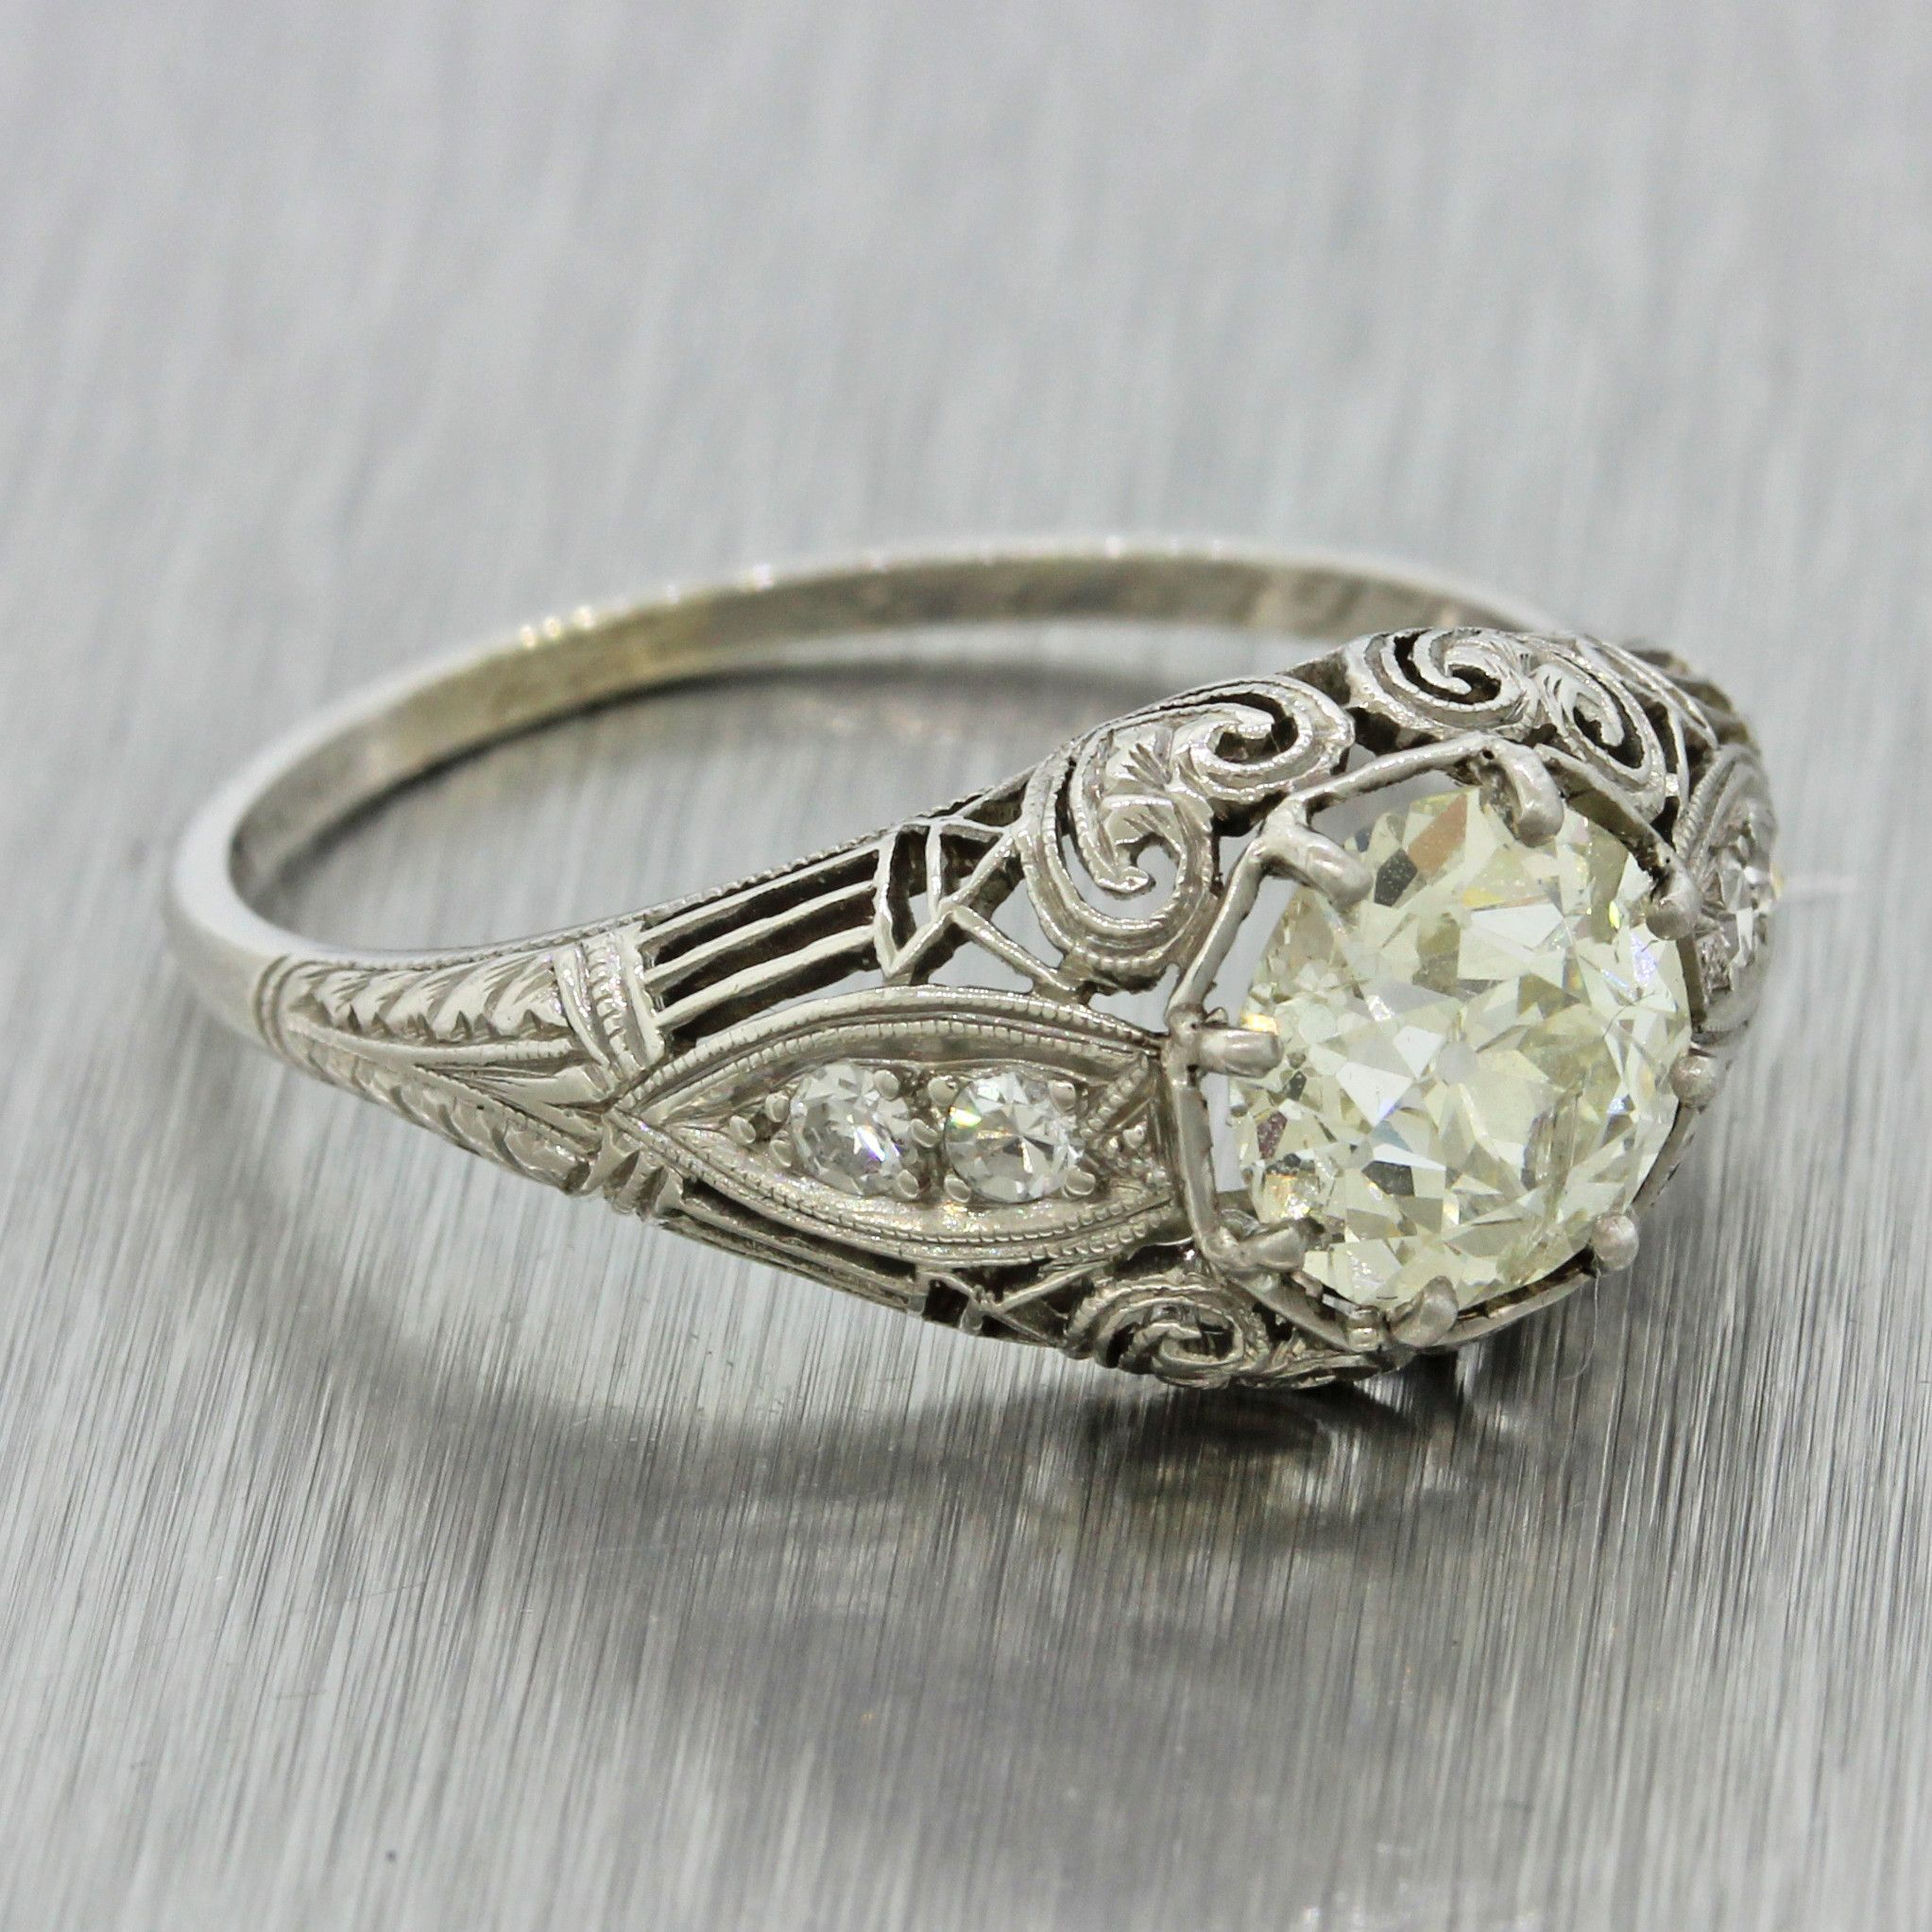 This is an antique Art Deco platinum diamond engagement